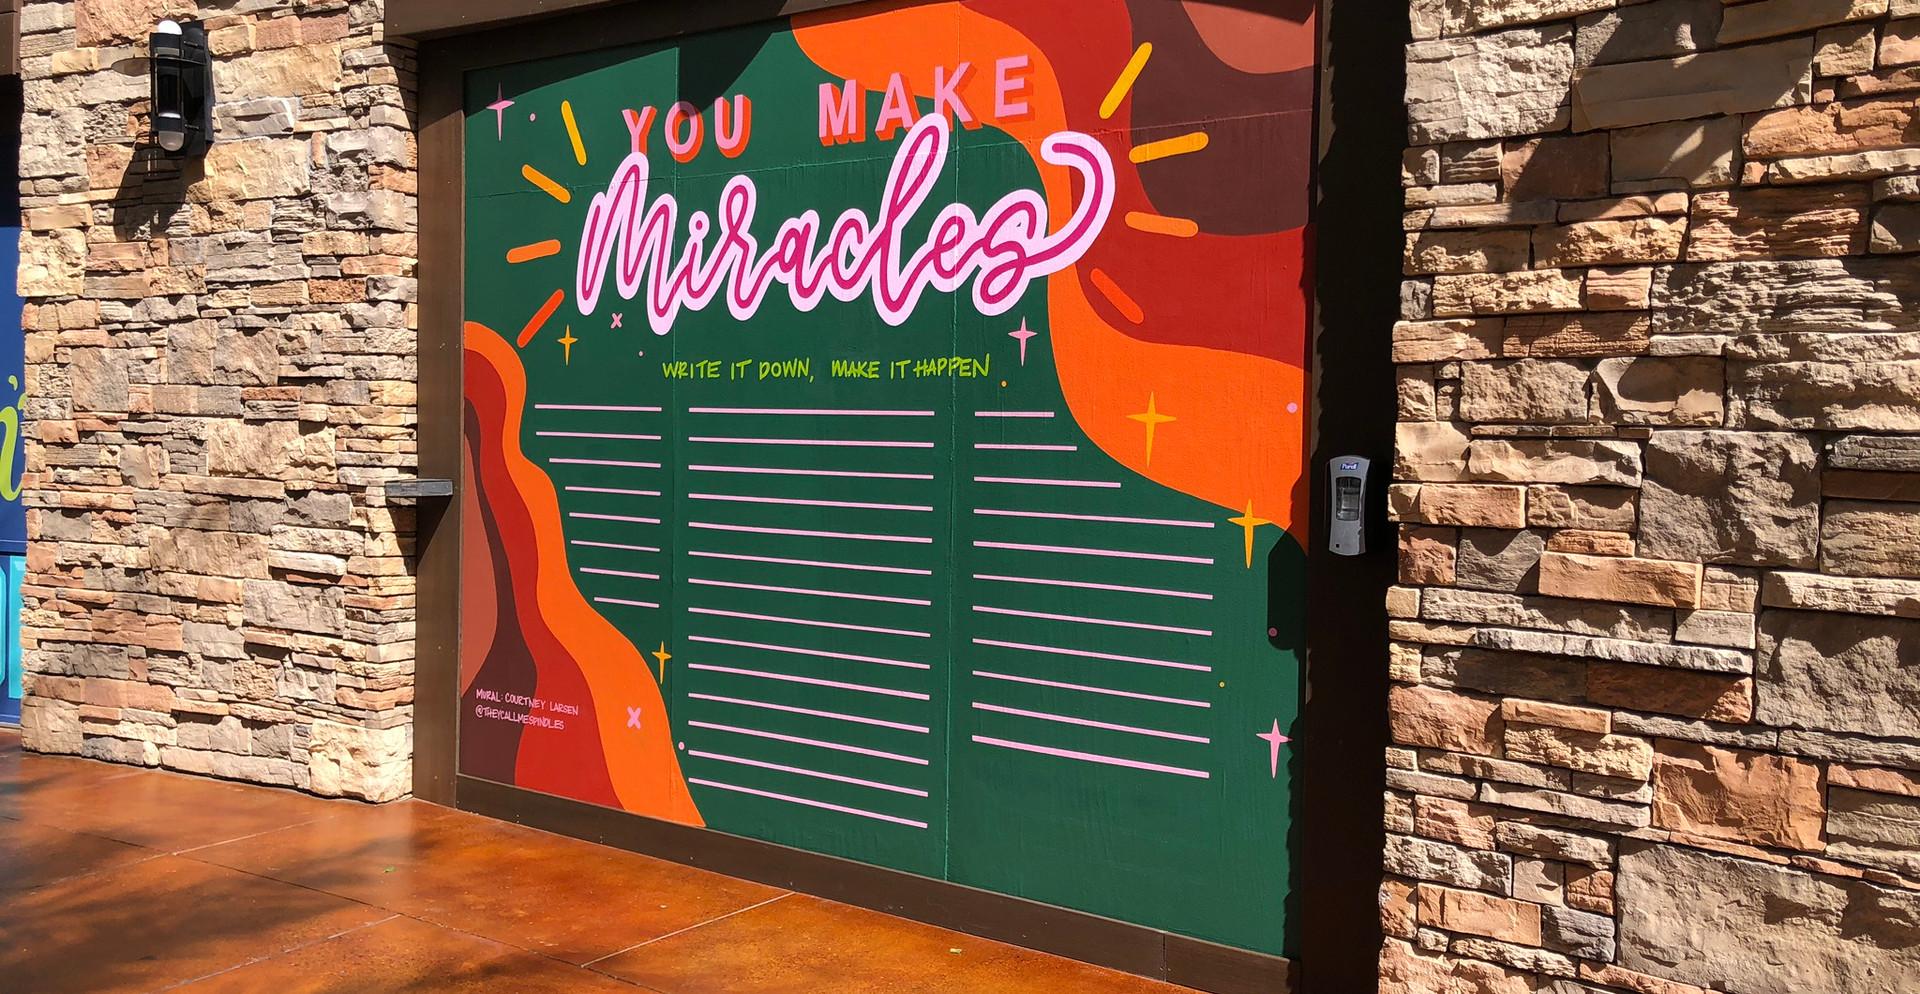 Desert Ridge Marketplace Interactive Chalkboard Mural